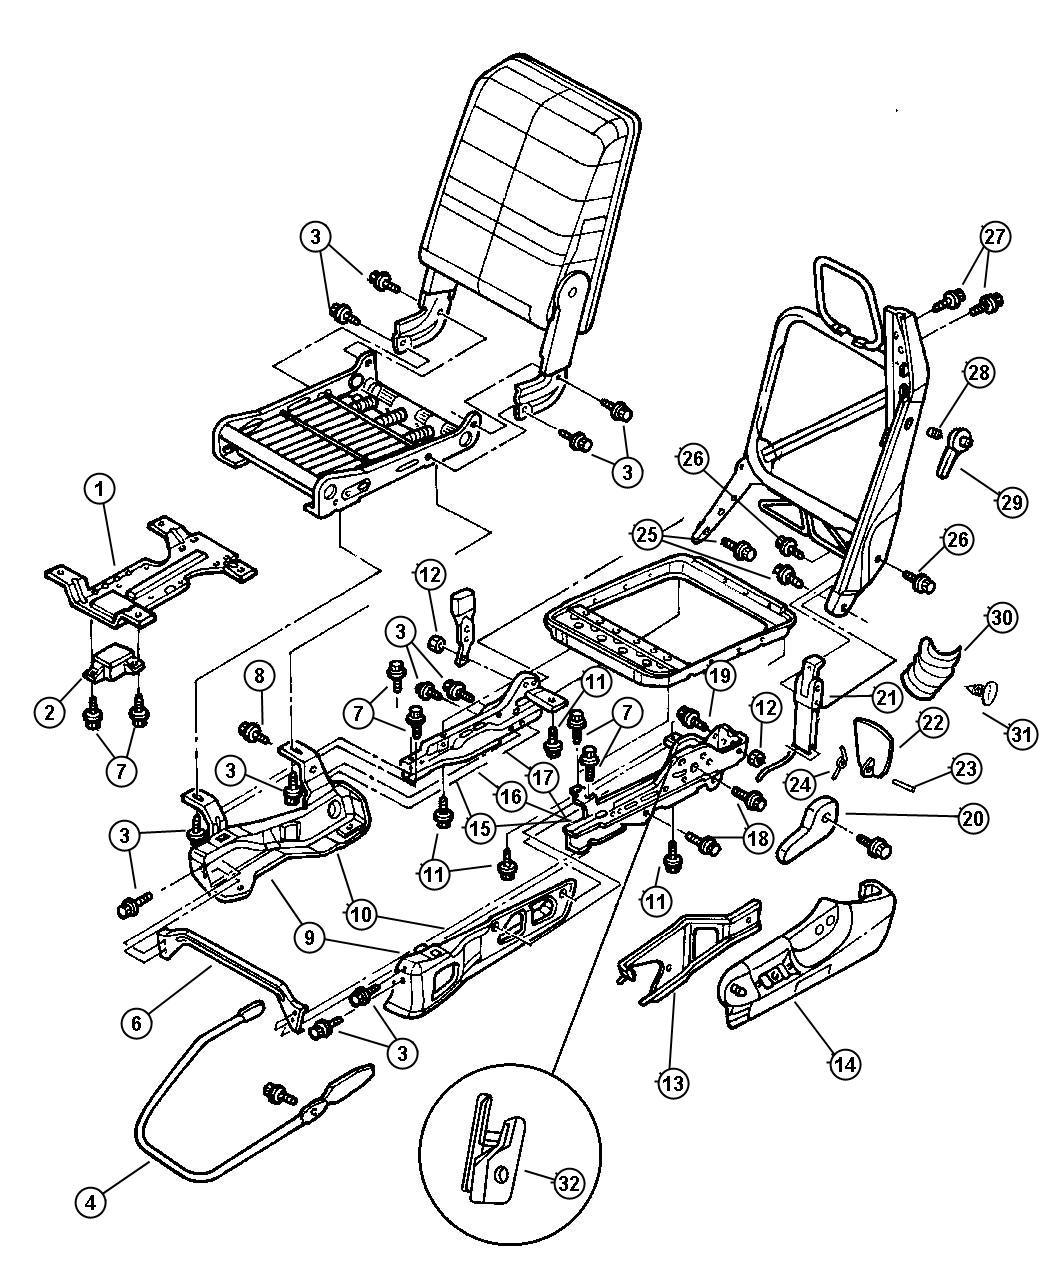 1998 Dodge Ram 1500 Module. Seat belt timer. 40/20/40